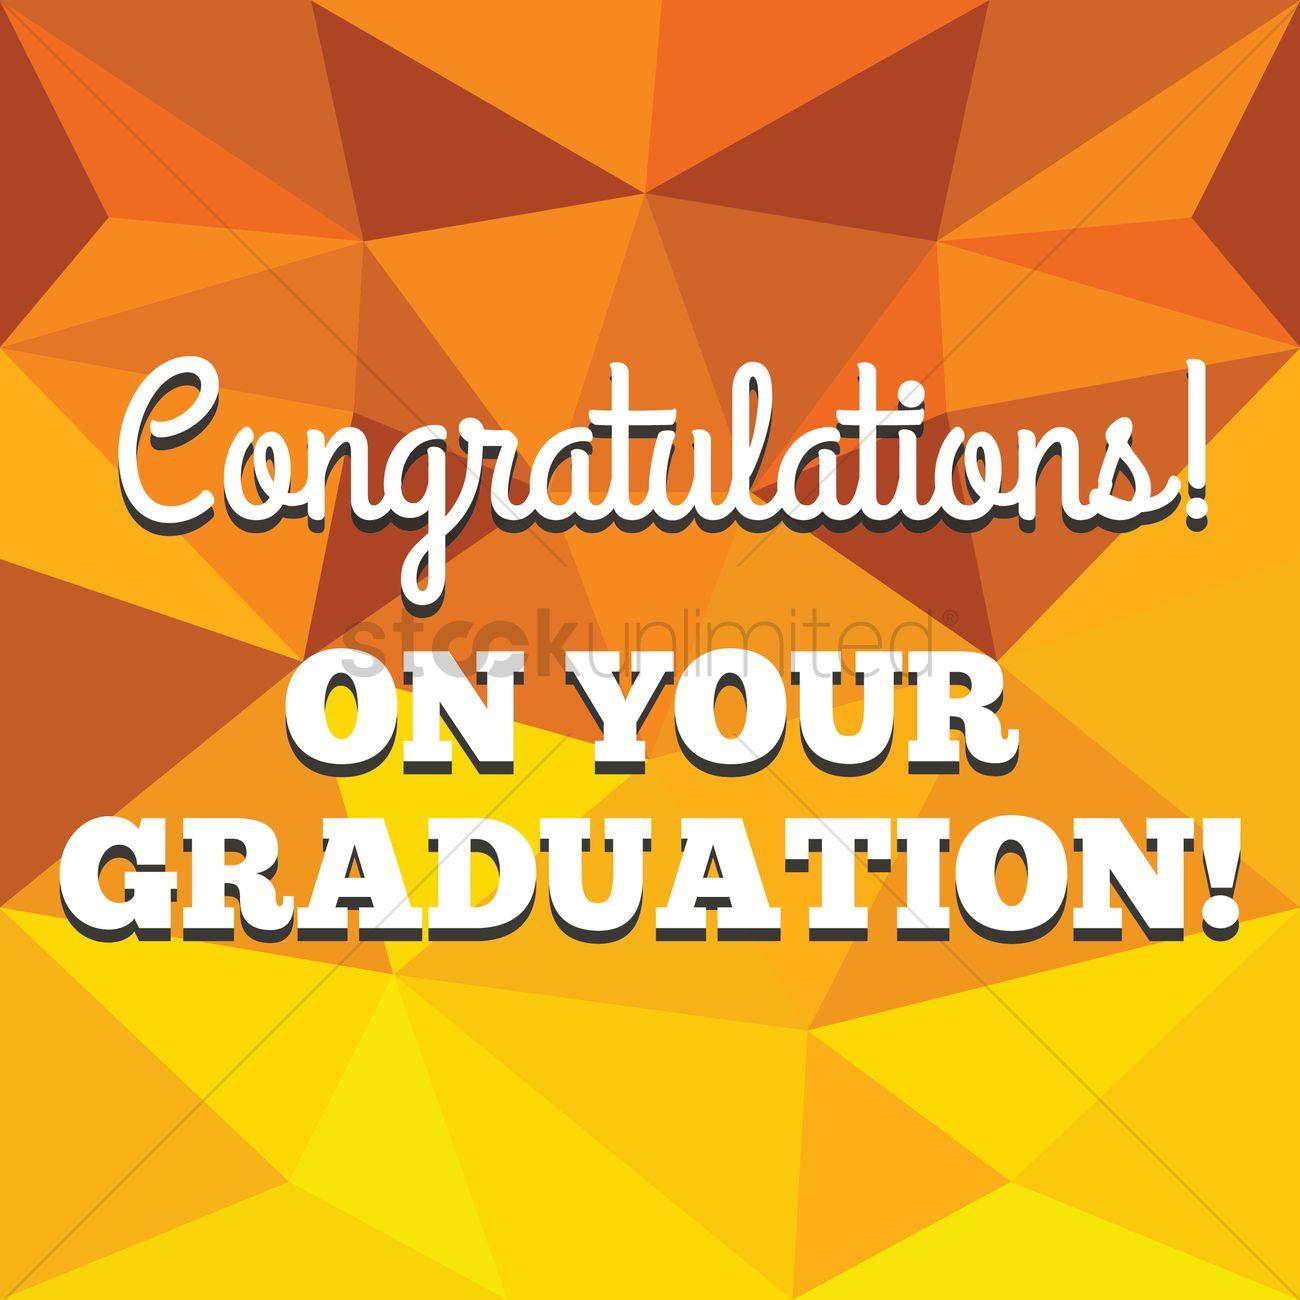 congratulations on your graduation card ベクタークリップアート